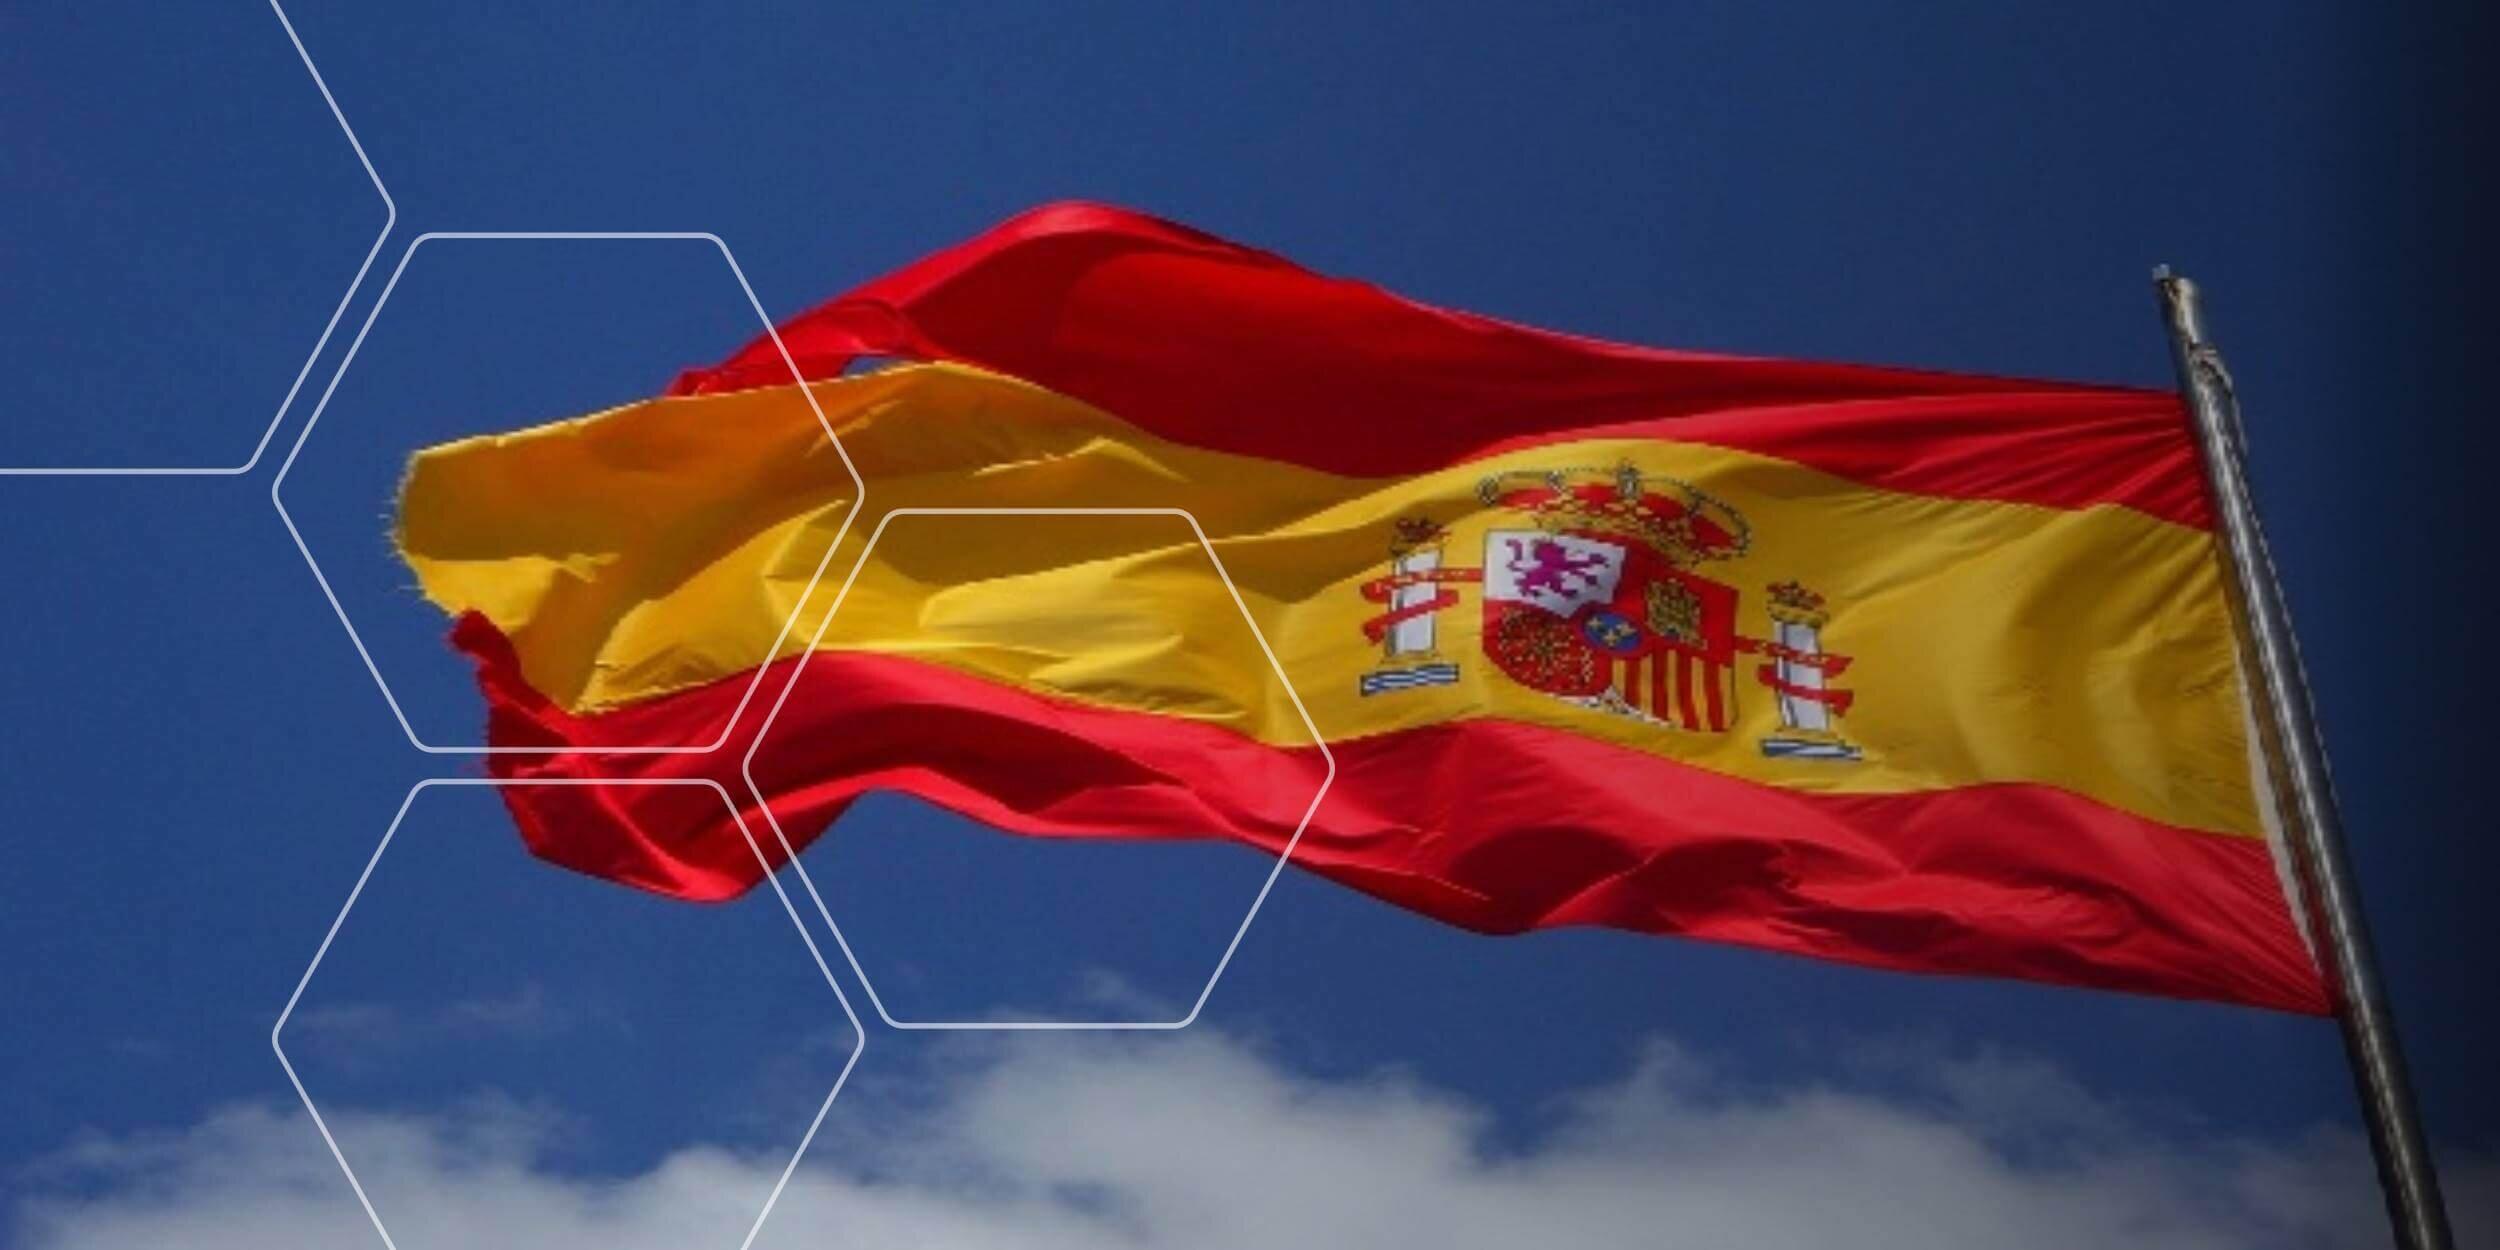 Spaanse-vlag_2500-1250 grid tiny.jpg